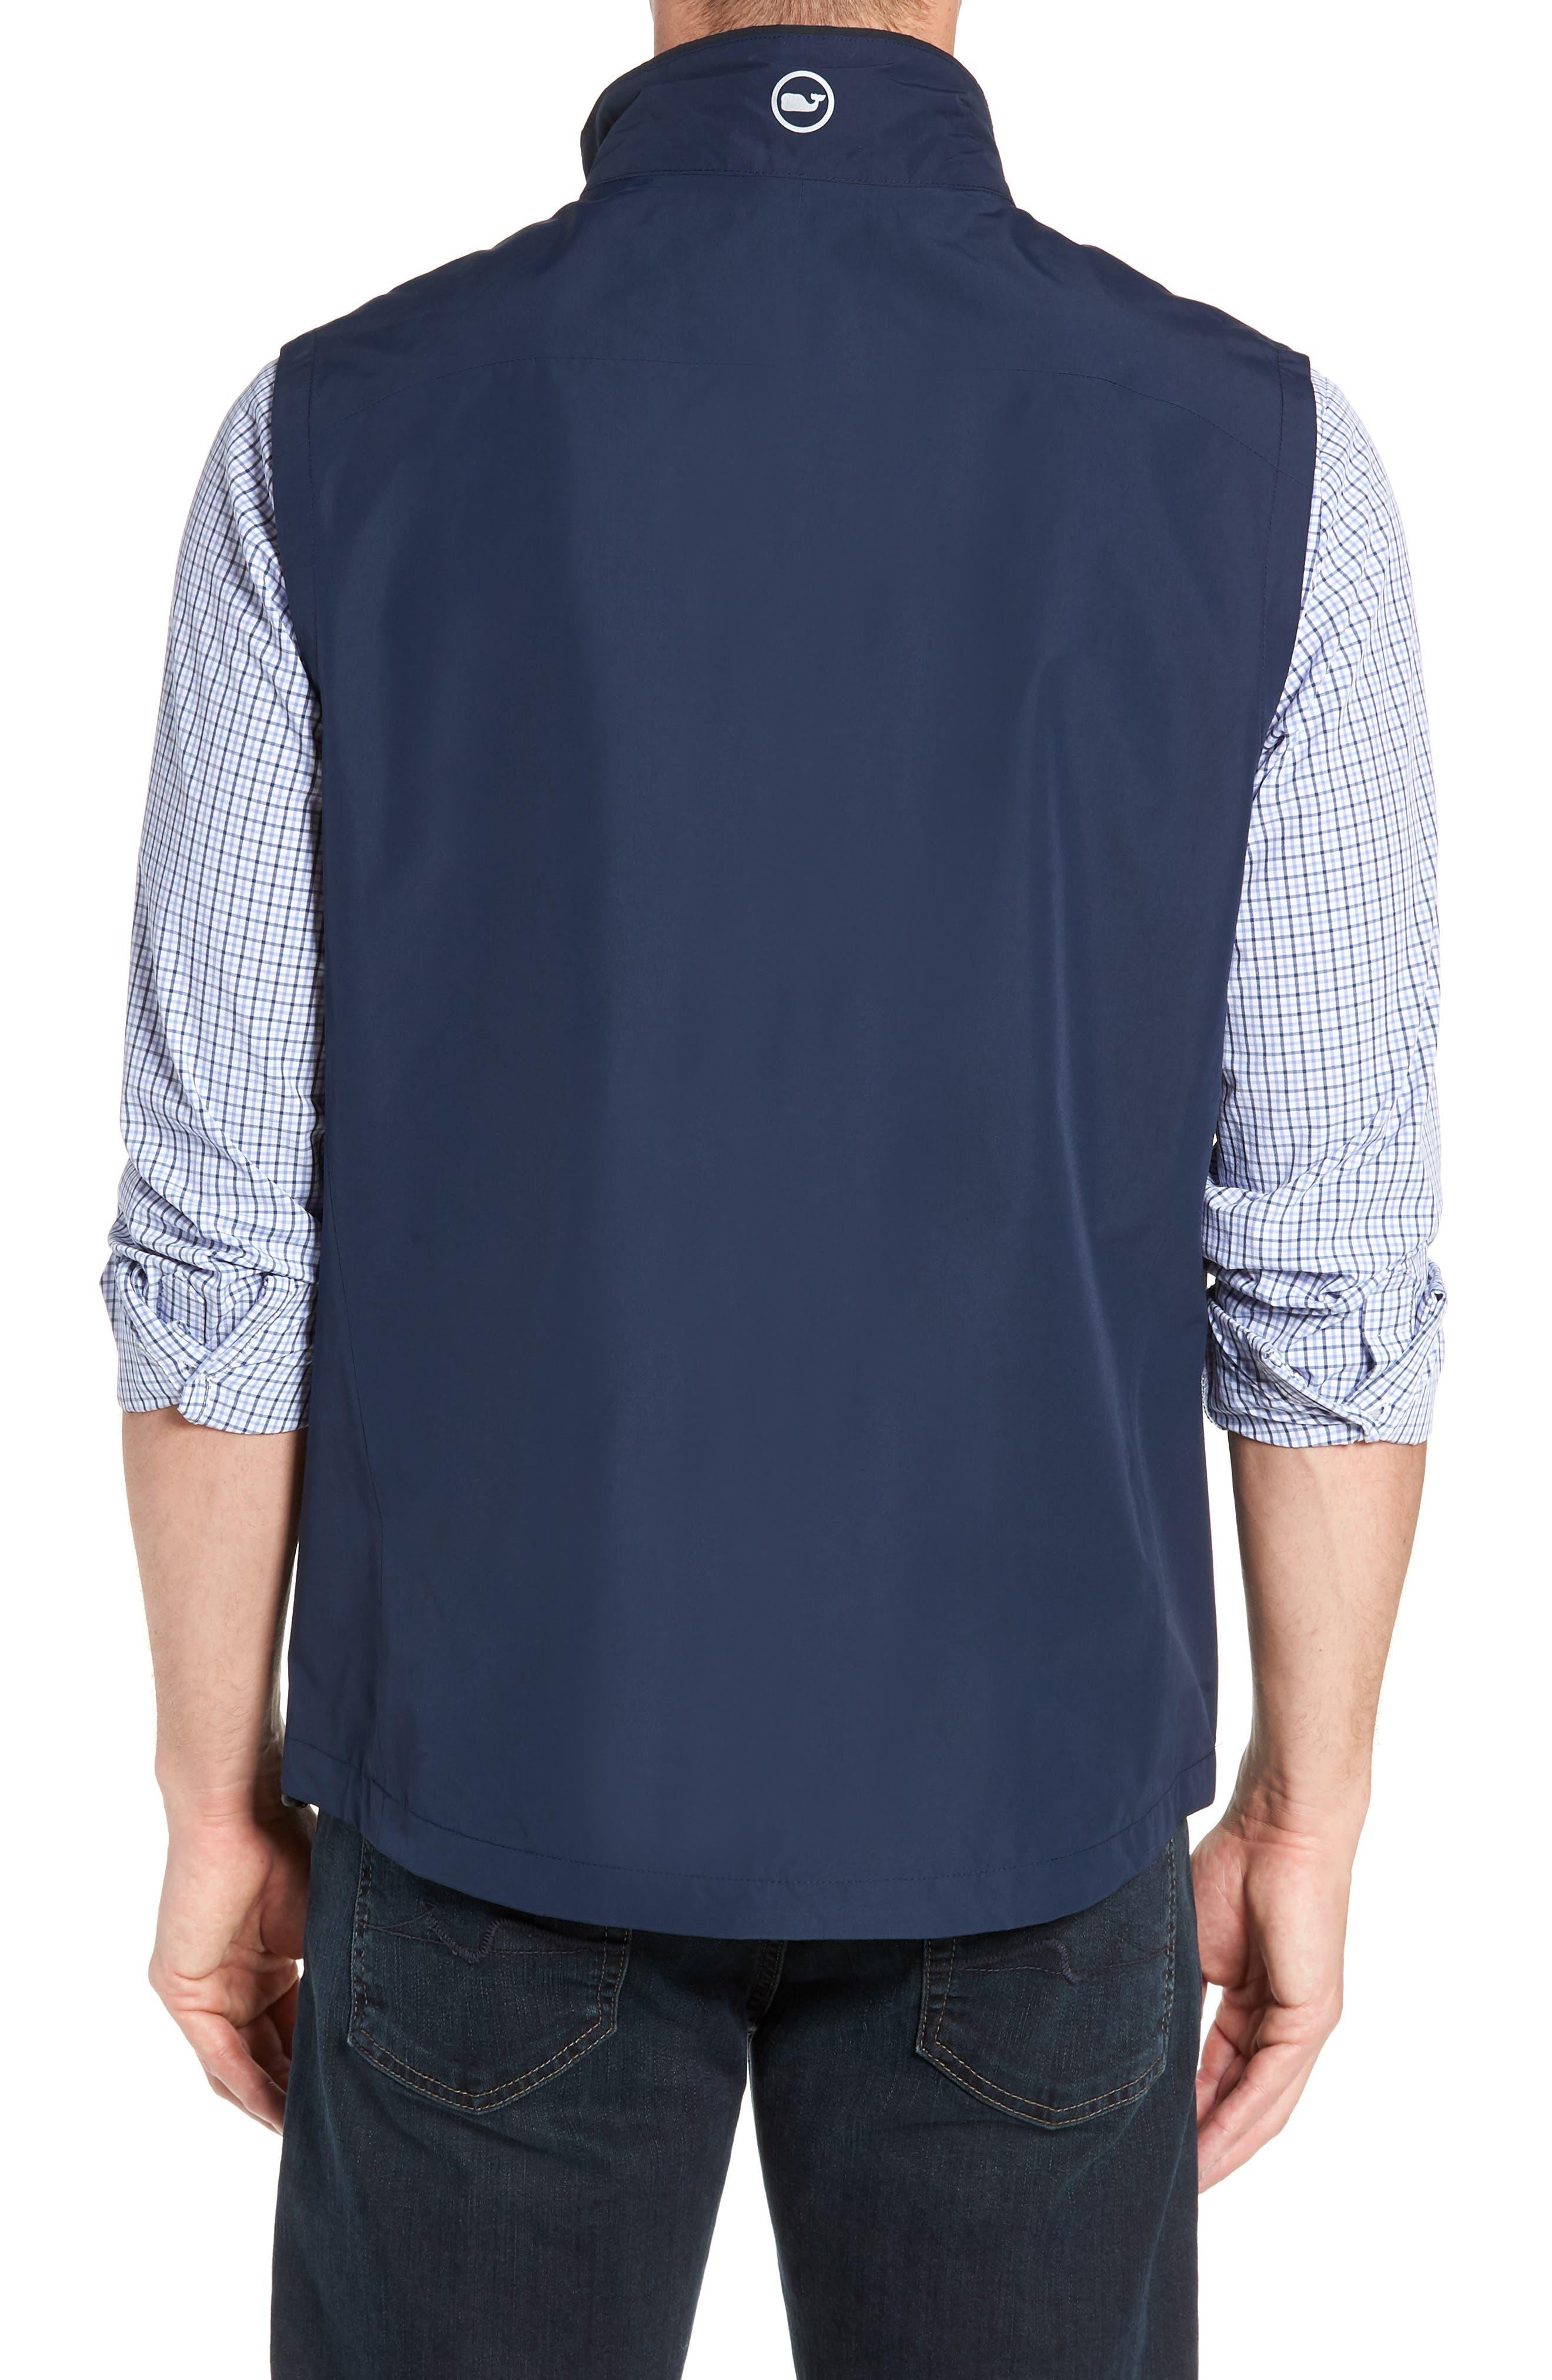 Tech Windbreaker Vest,                             Alternate thumbnail 2, color,                             410